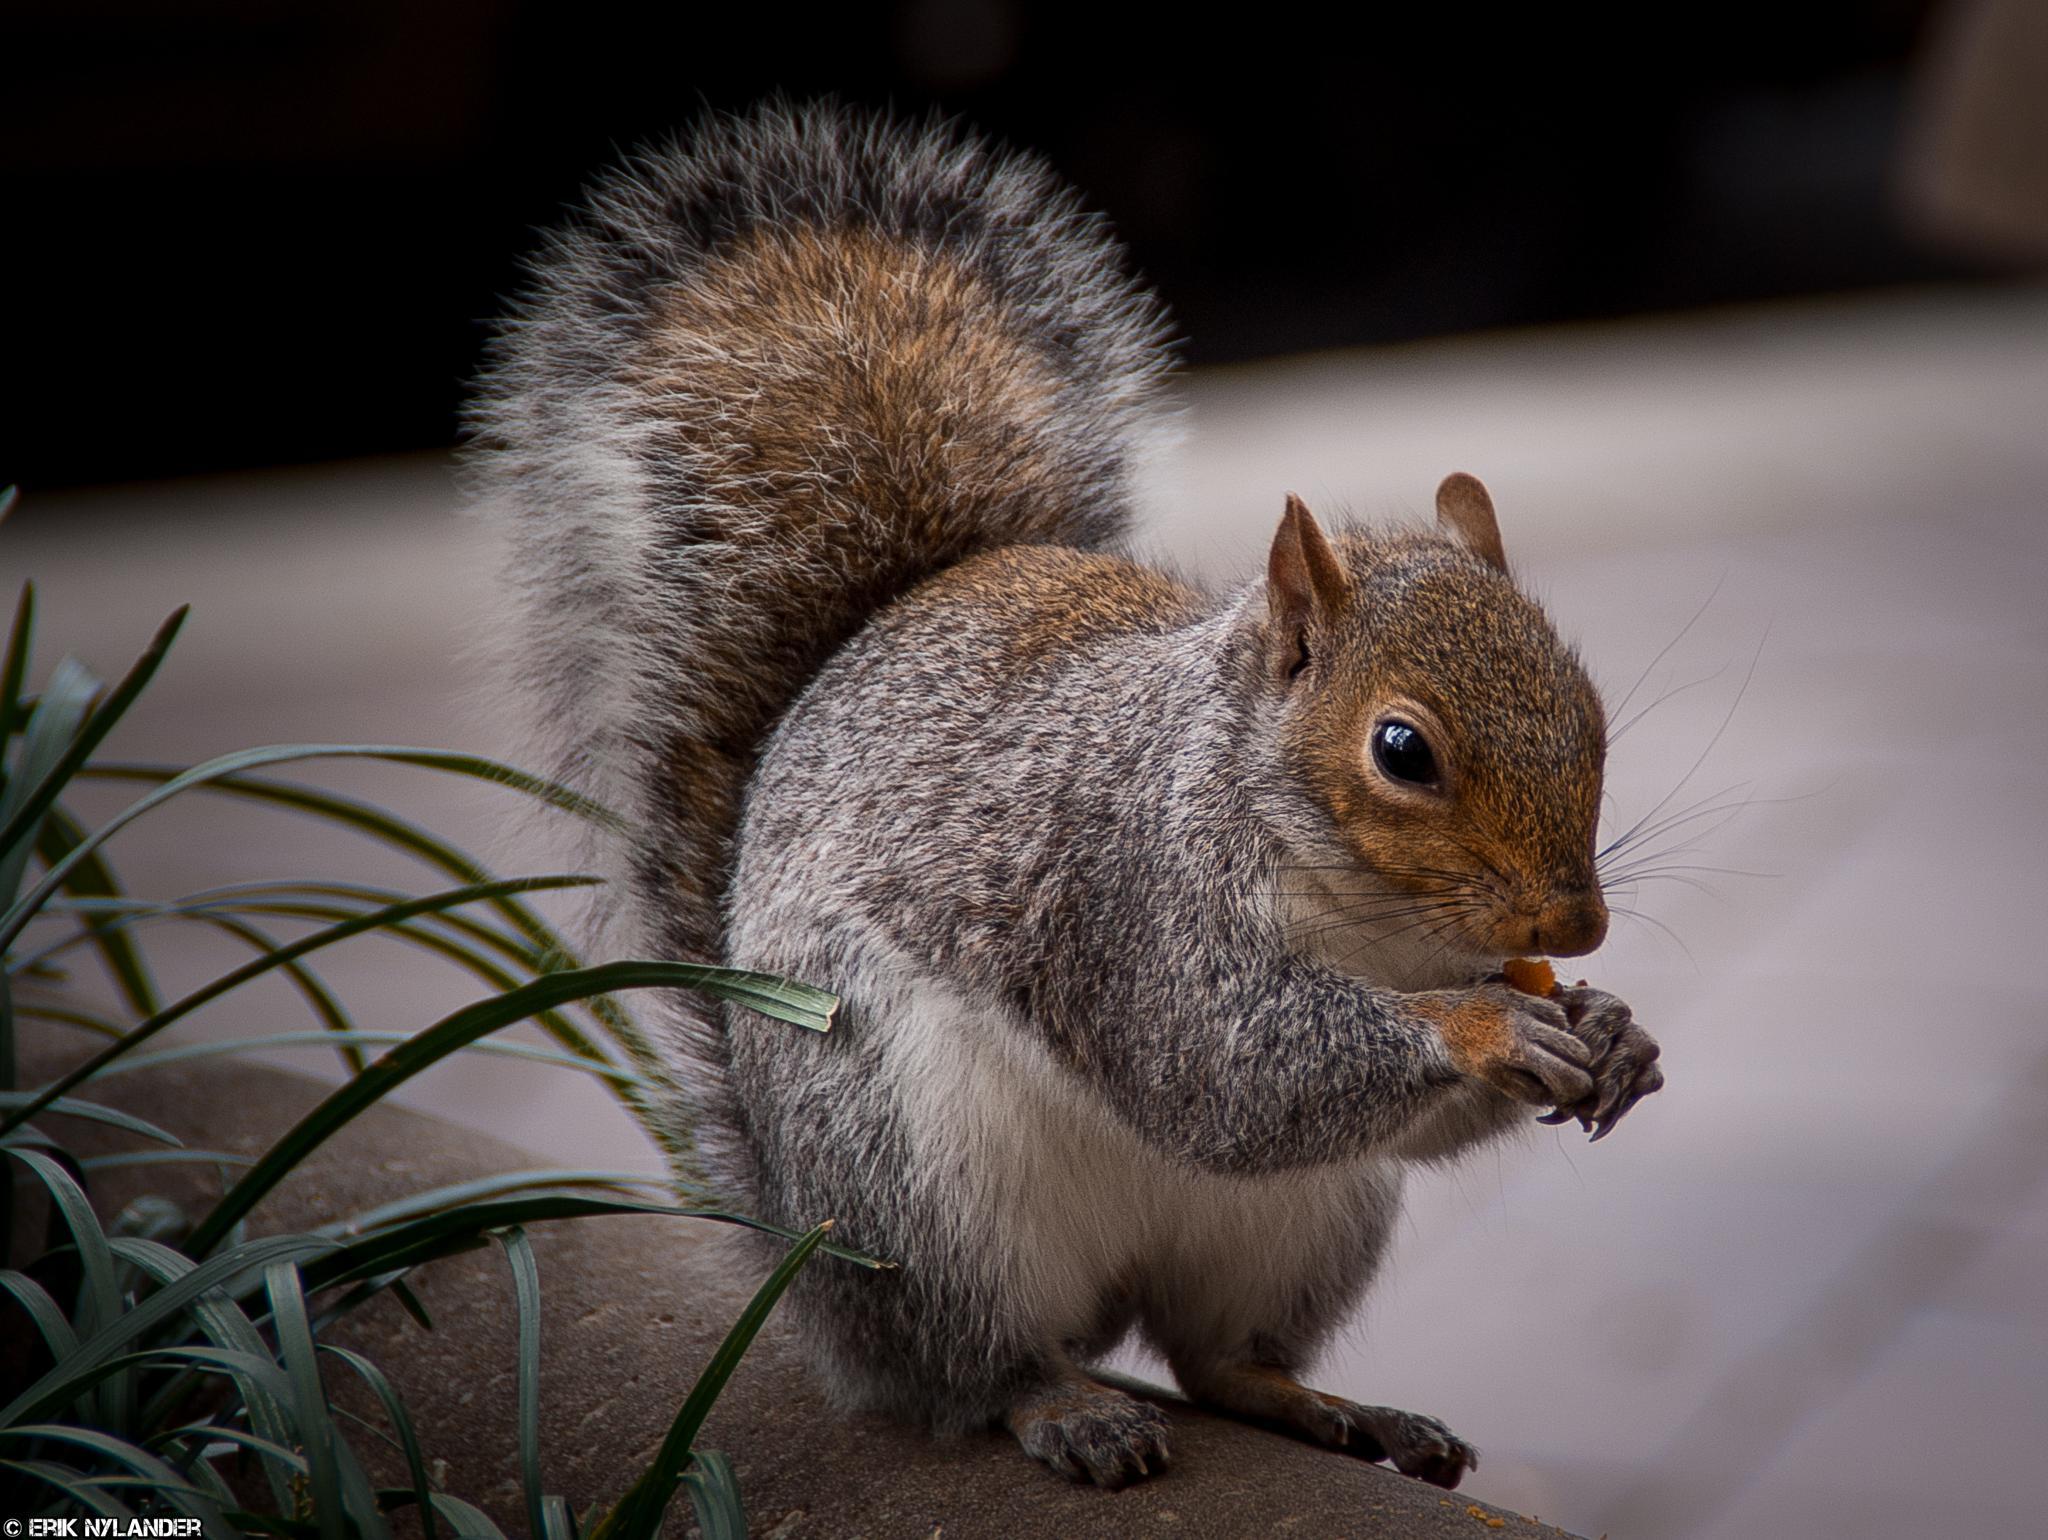 Squirrel by Erik Nylander